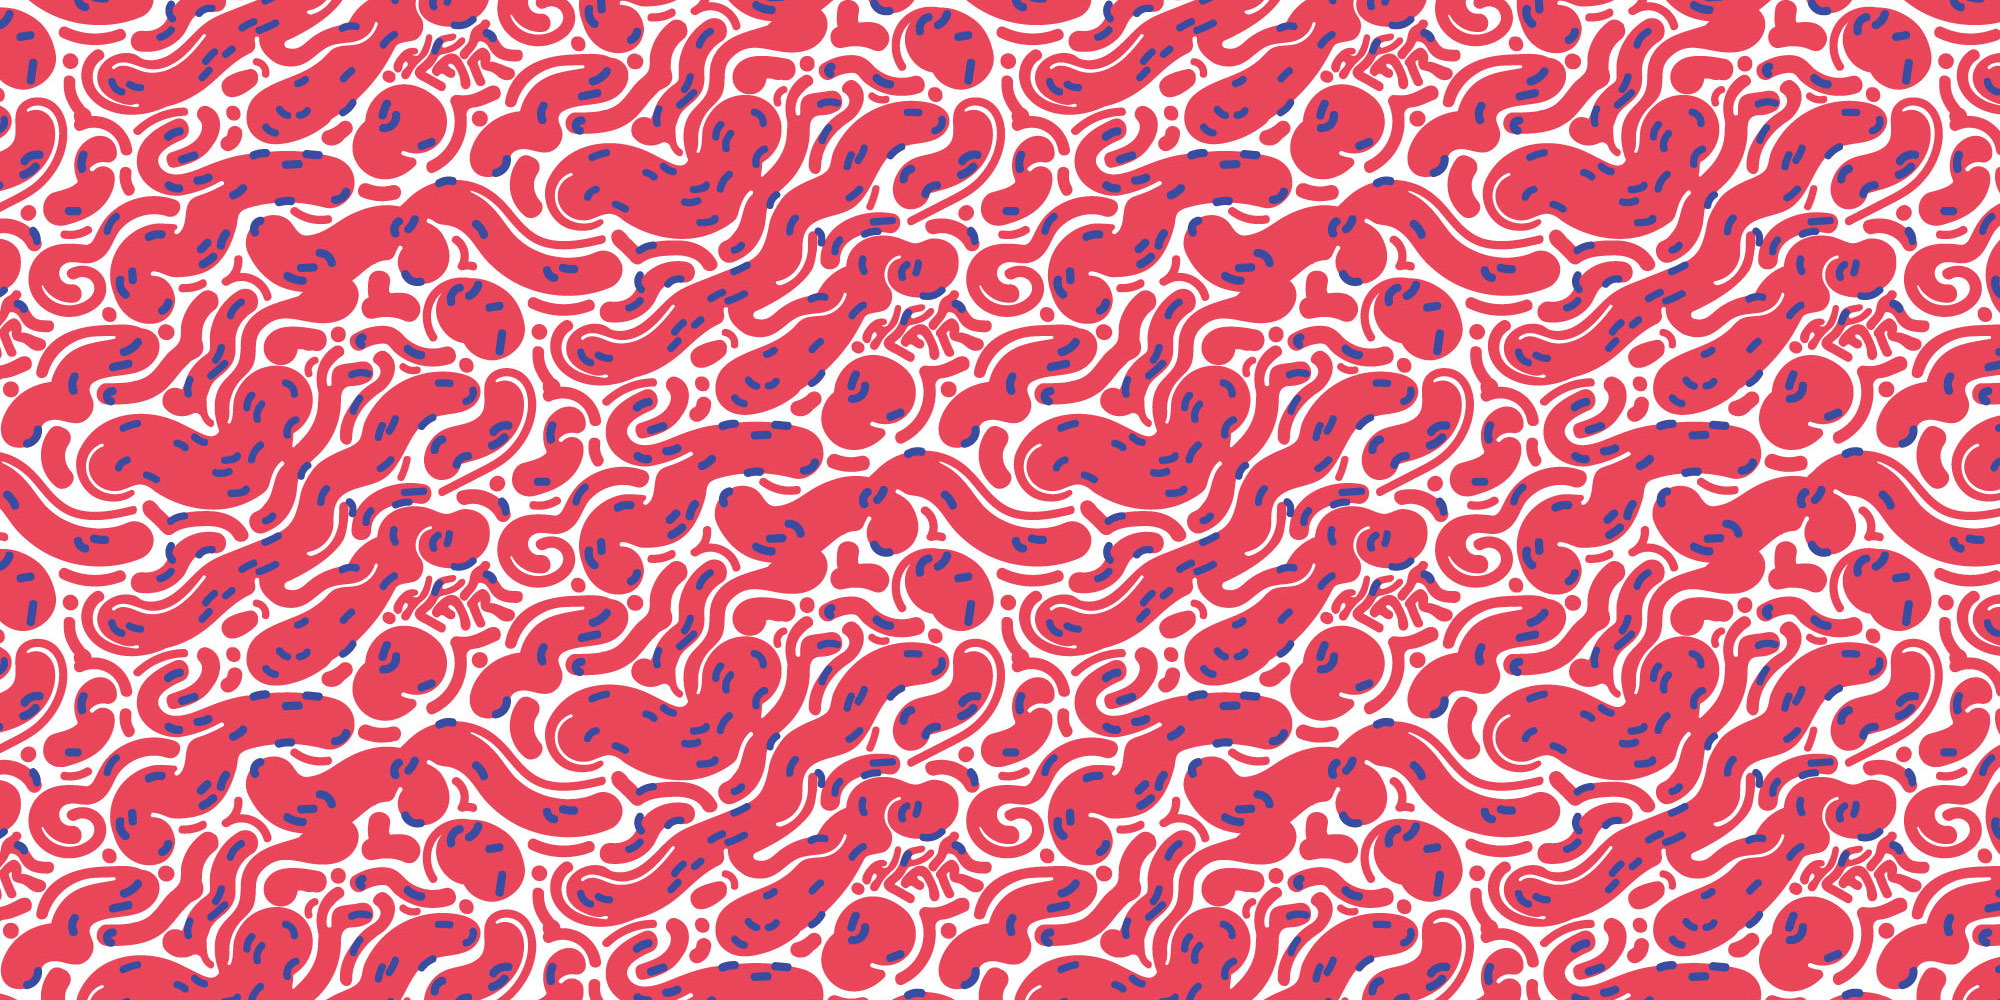 heart pattern full